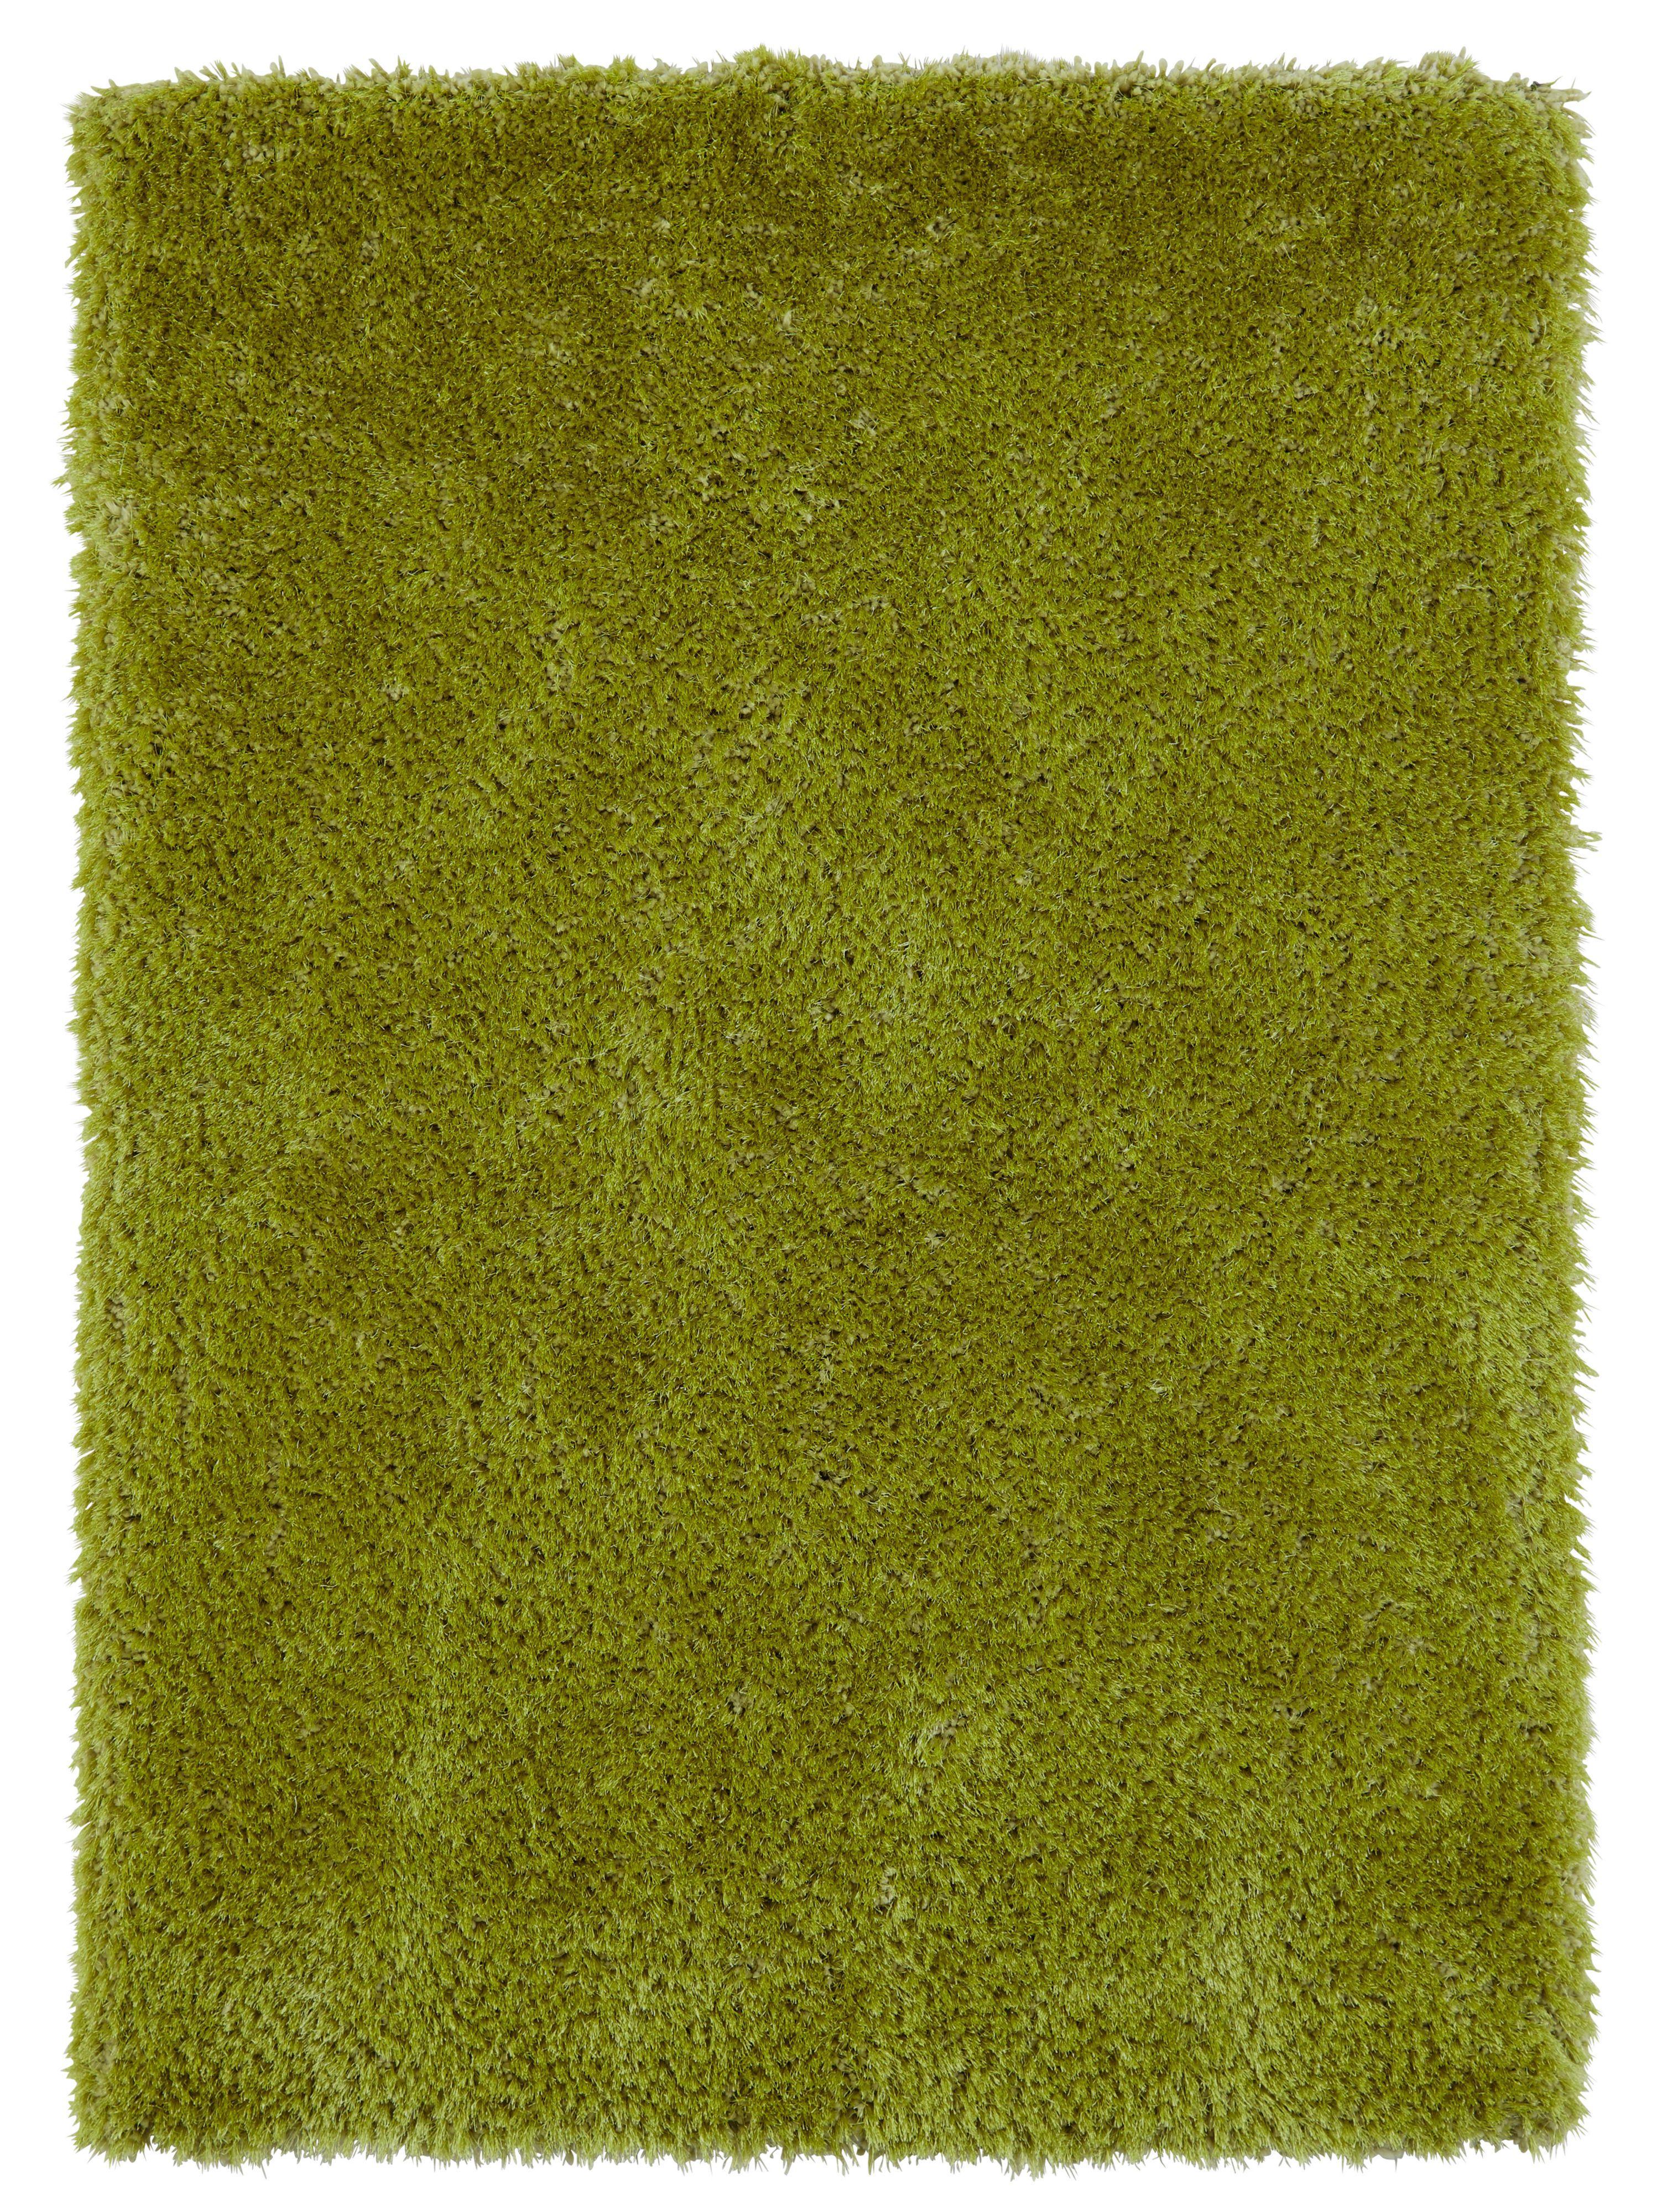 green rug texture. green rug texture